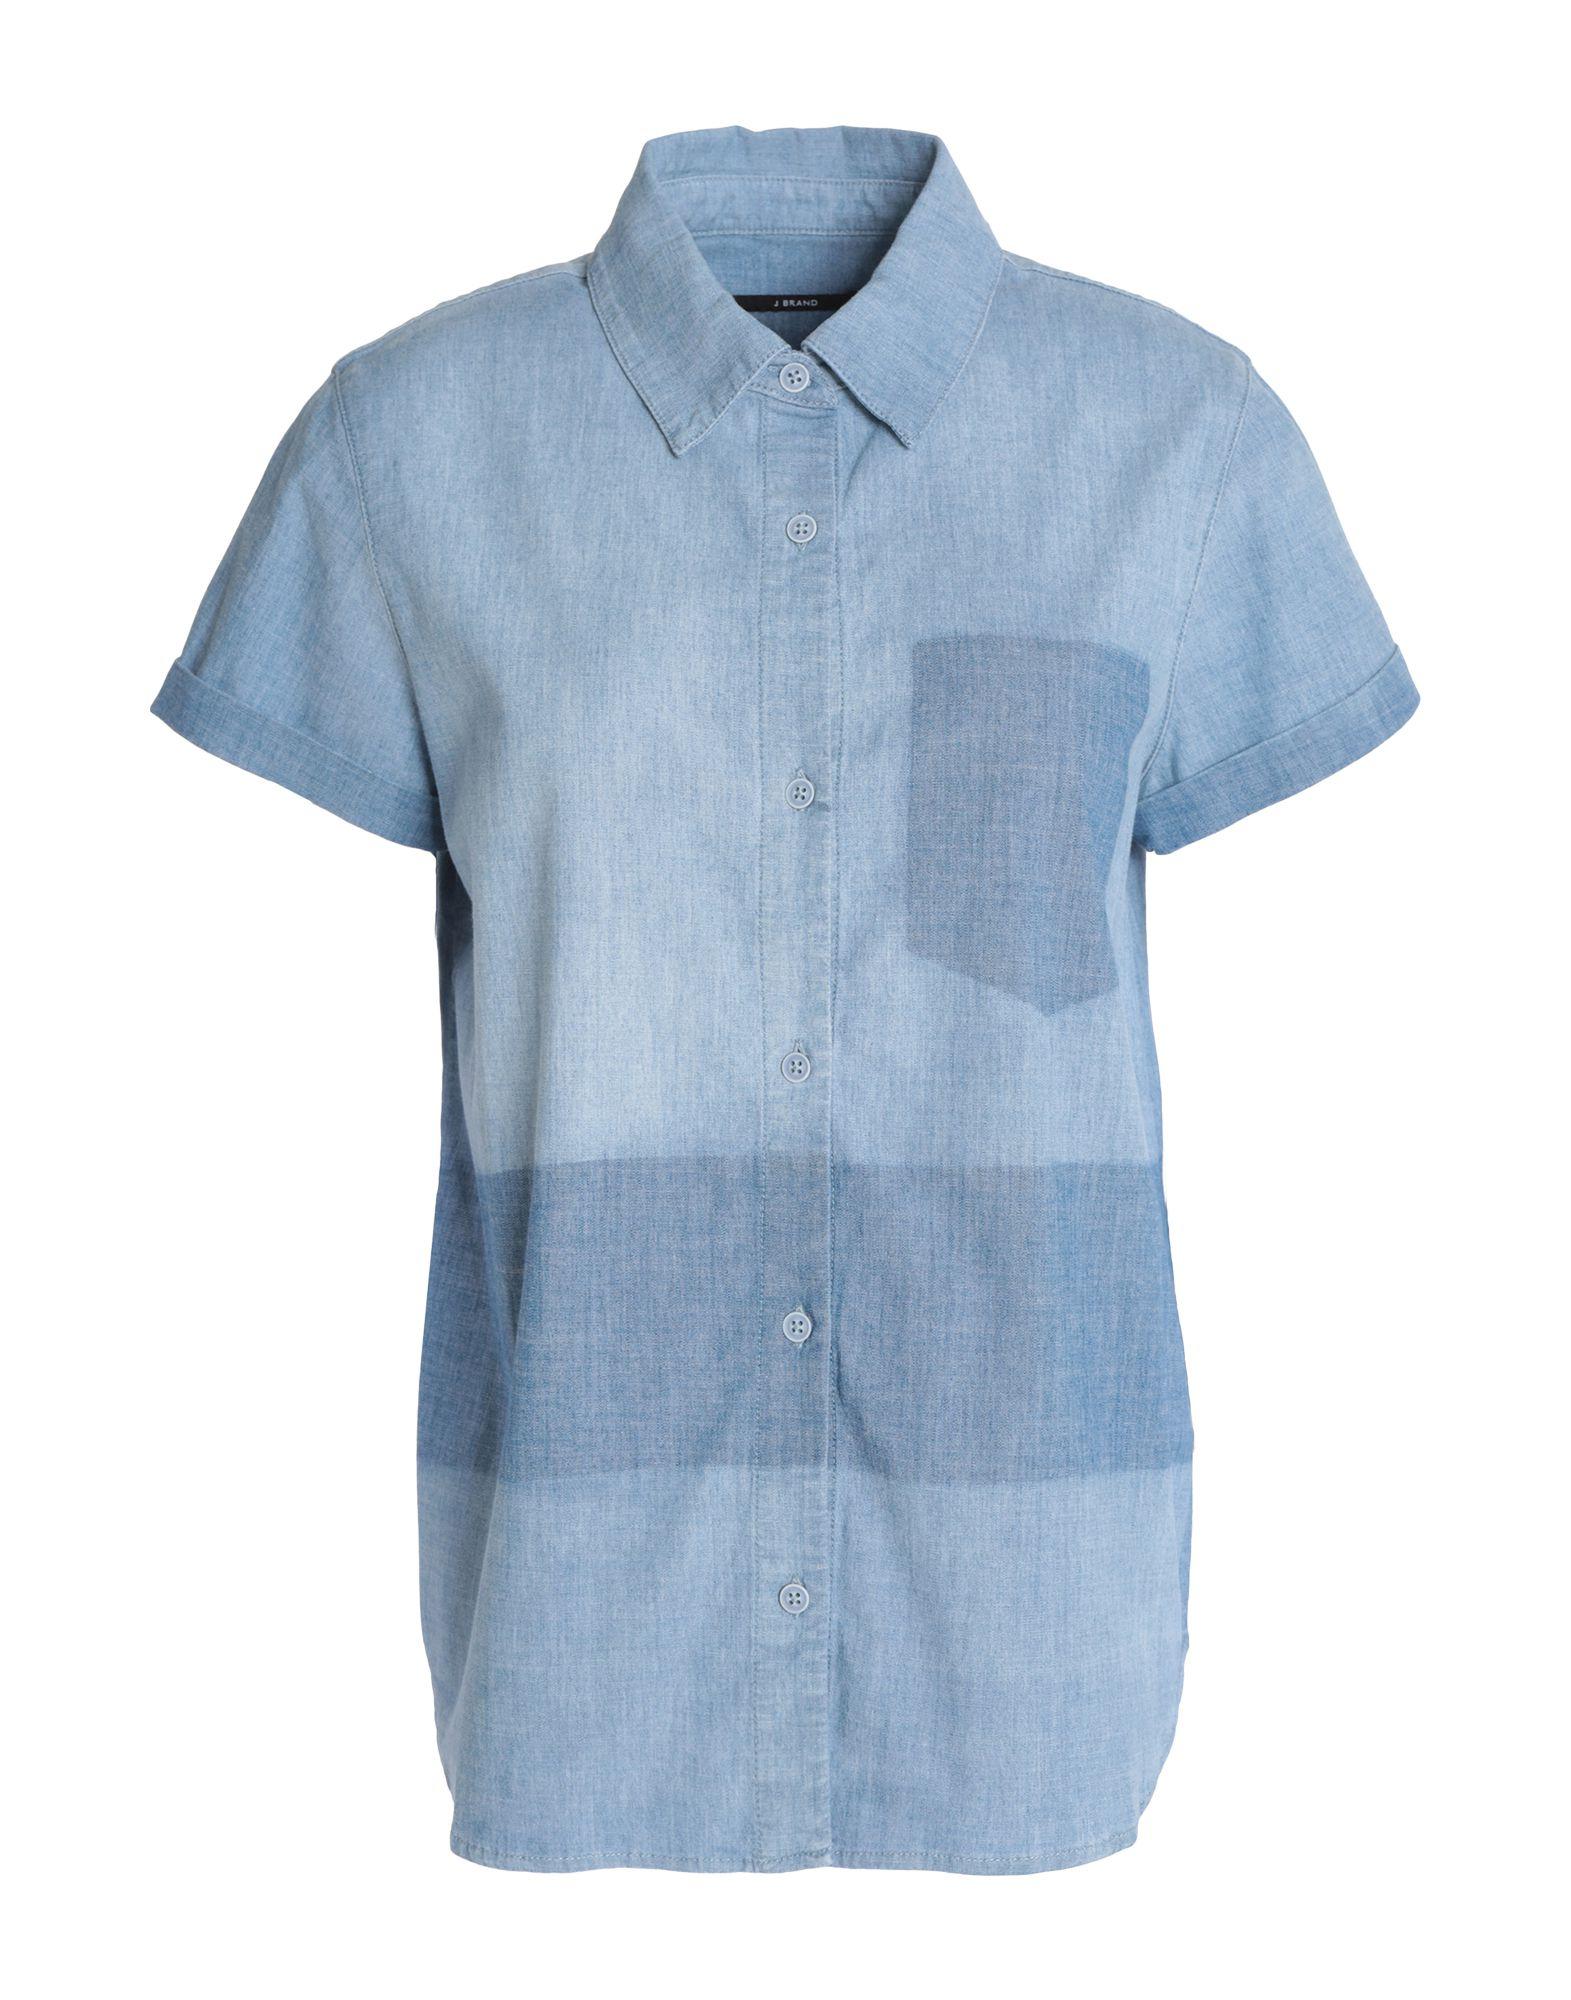 J BRAND Джинсовая рубашка low brand джинсовая рубашка